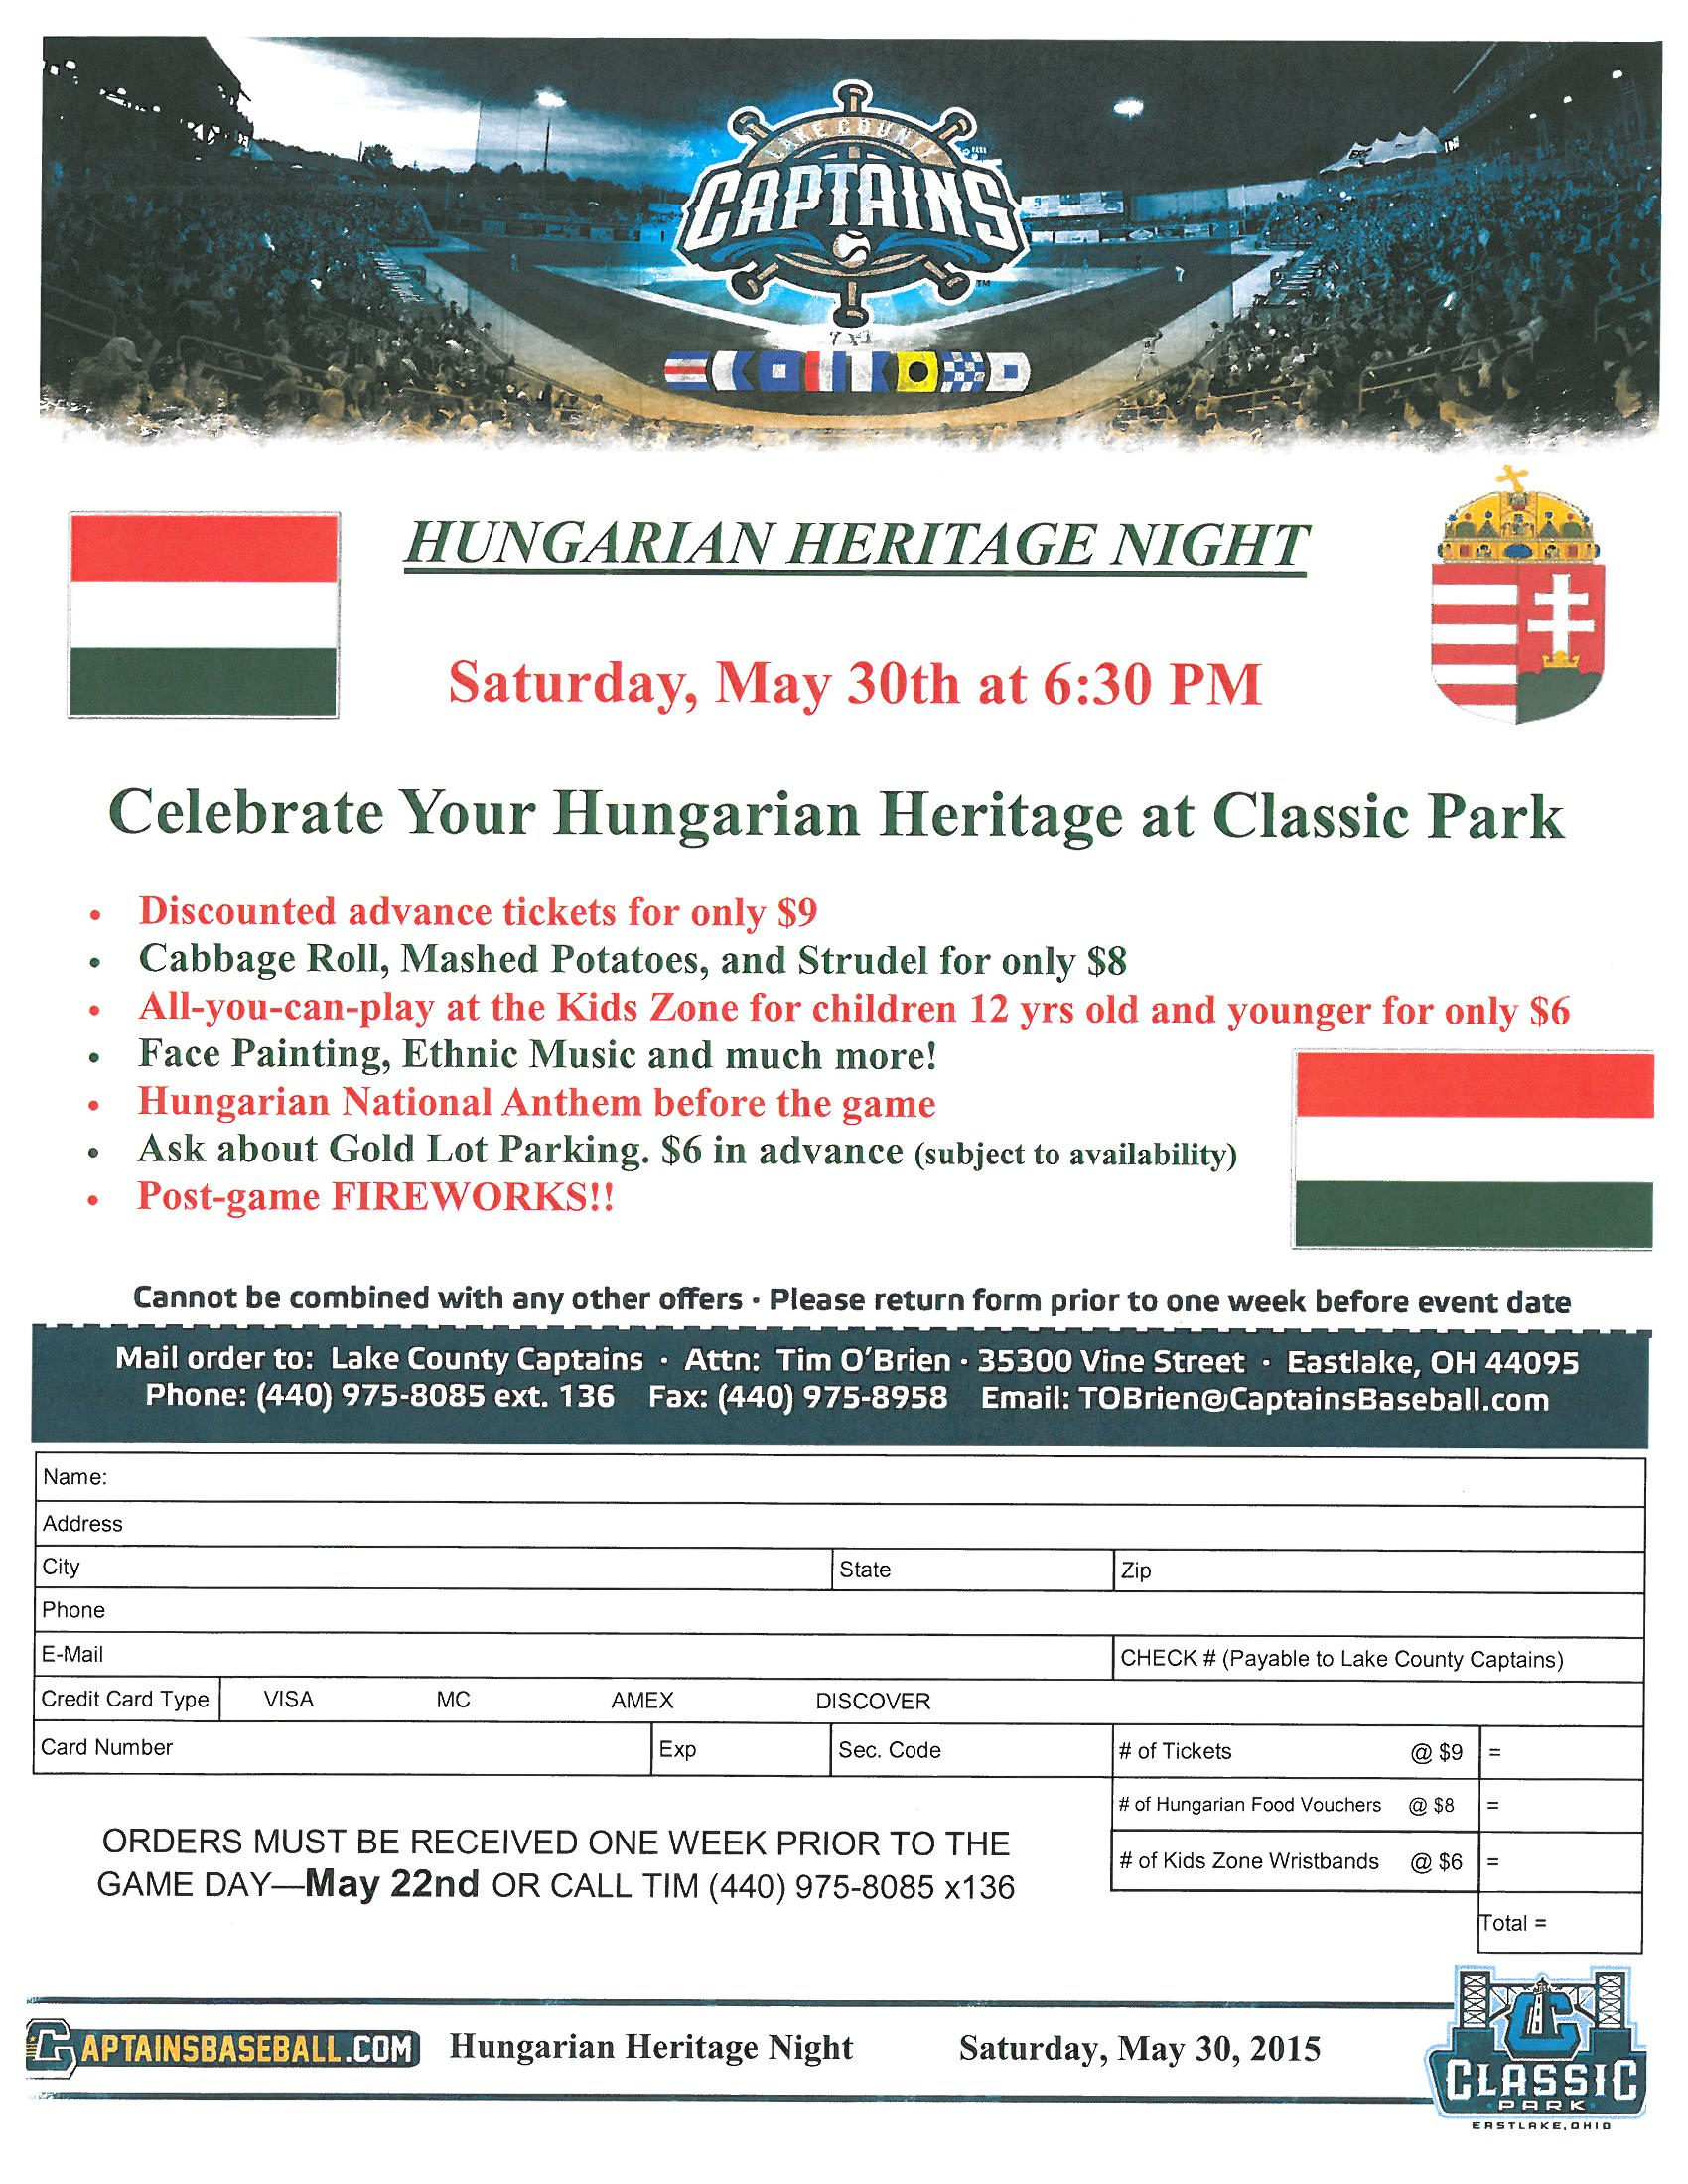 2015 Hungarian Heritage Night flyer